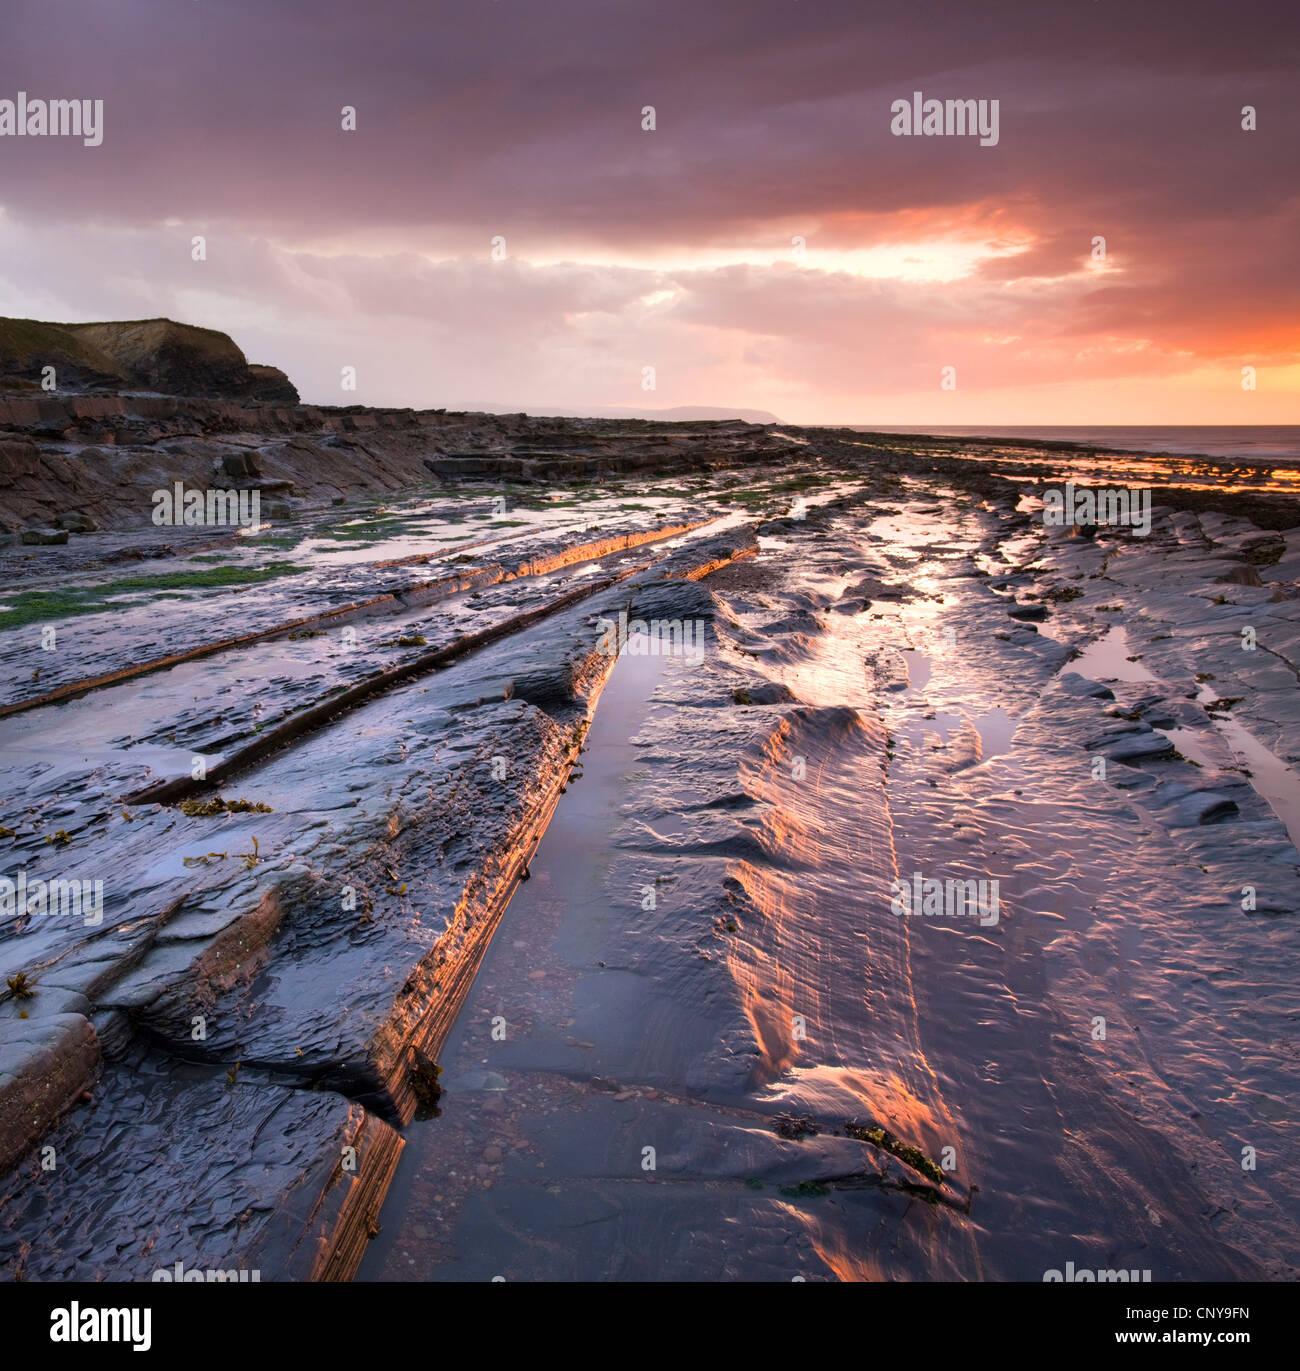 Horiztonal rock strata on Kilve Beach on the North Somerset coast, England. Spring (May) 2009 - Stock Image